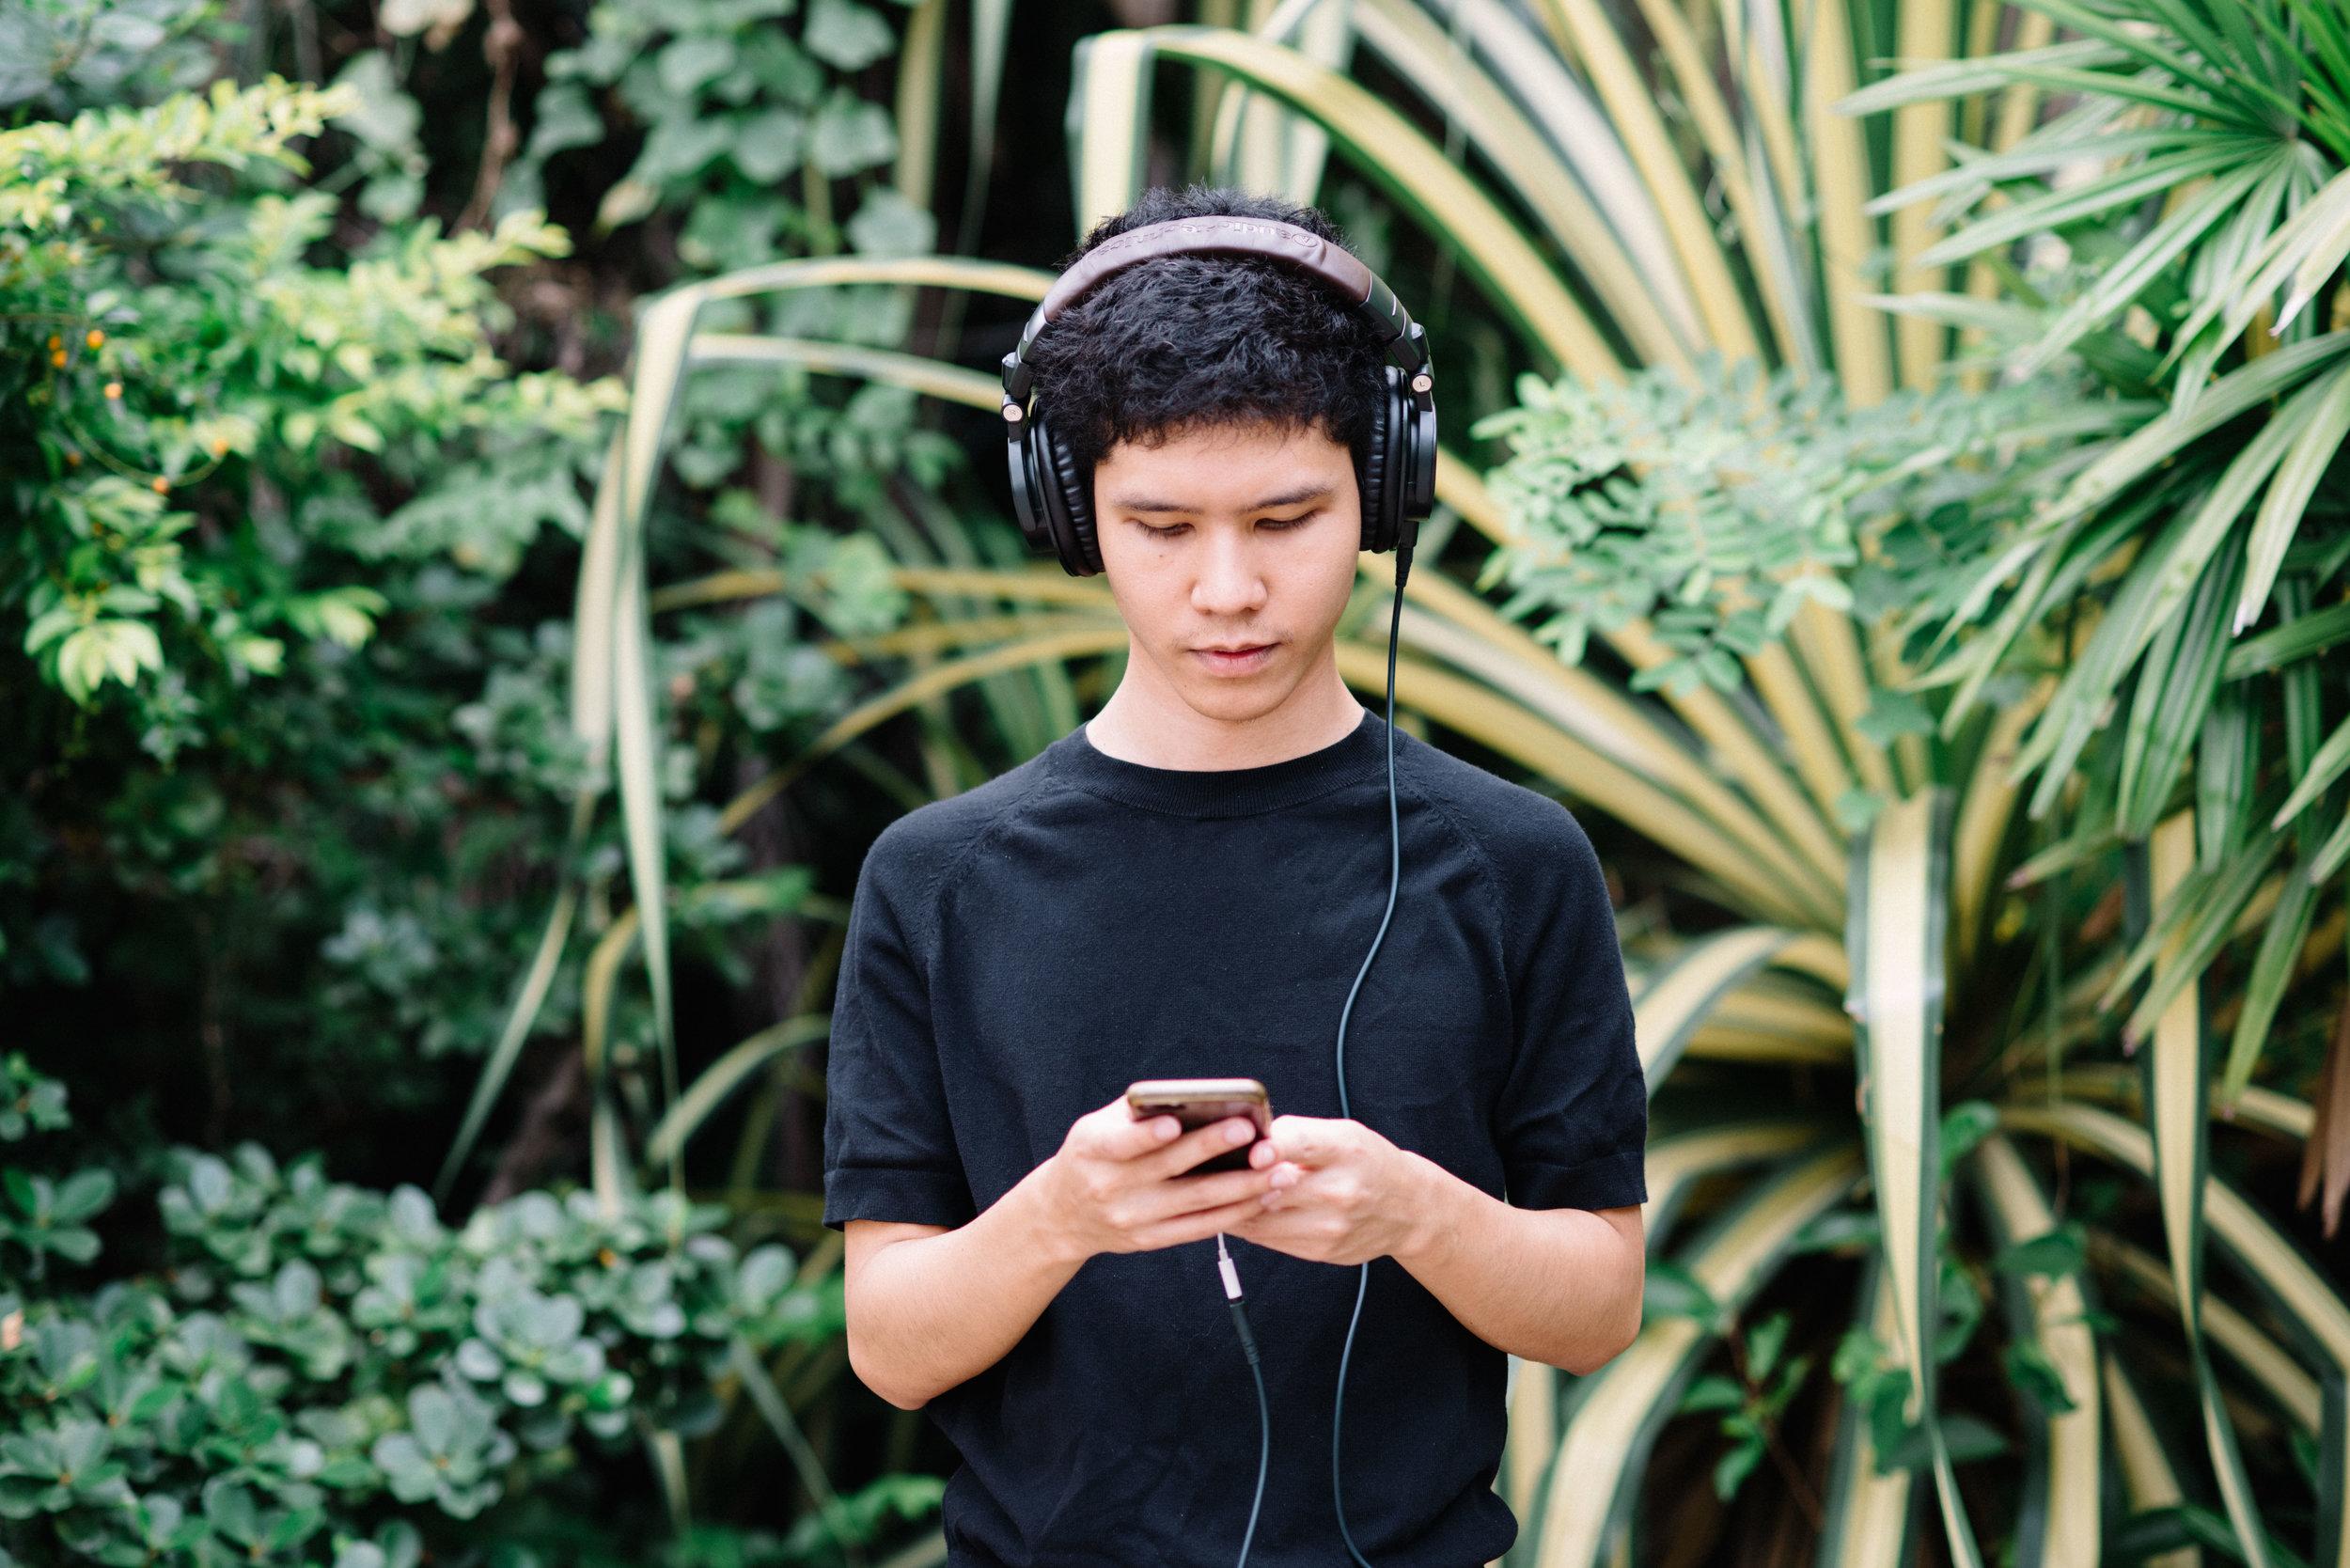 MUSICIAN PLERN PAN PERTH OUTSIDE HIS STUDIO IN BANGKOK. CREDIT: GRAHAM MEYER FOR LURE